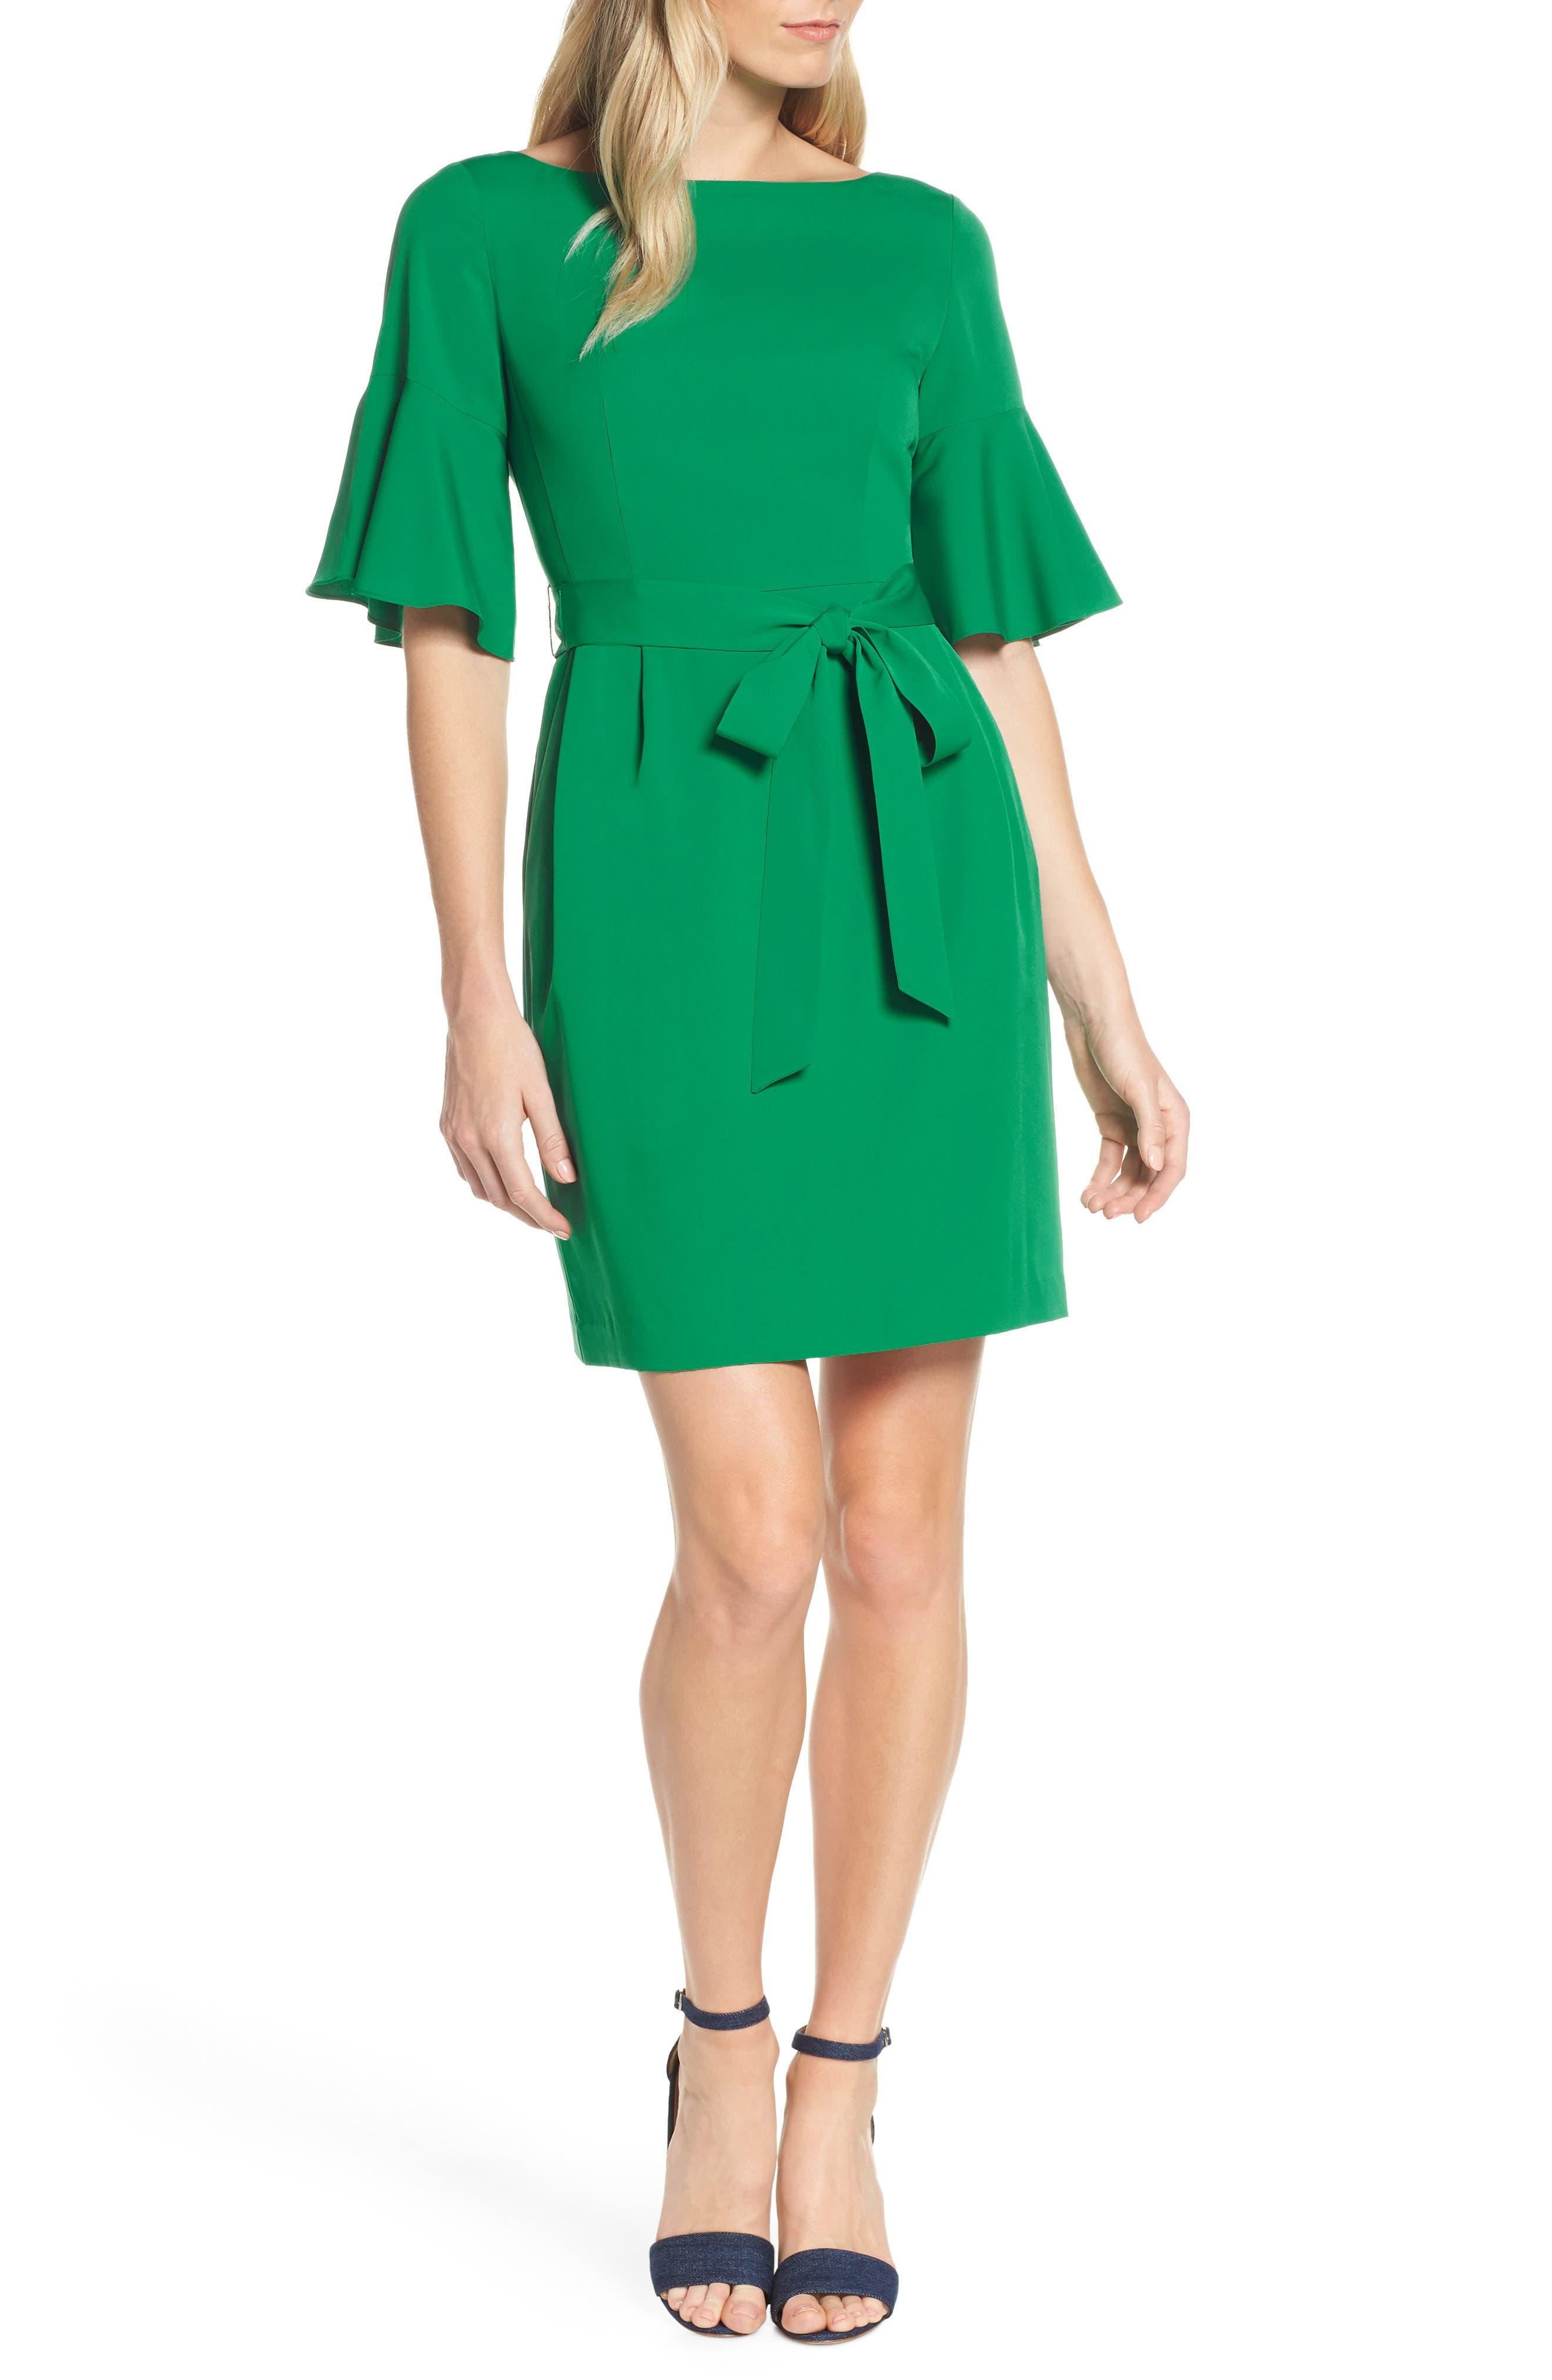 Eliza J Bell Sleeve Sheath Dress, 8 (similar to 1) - Green